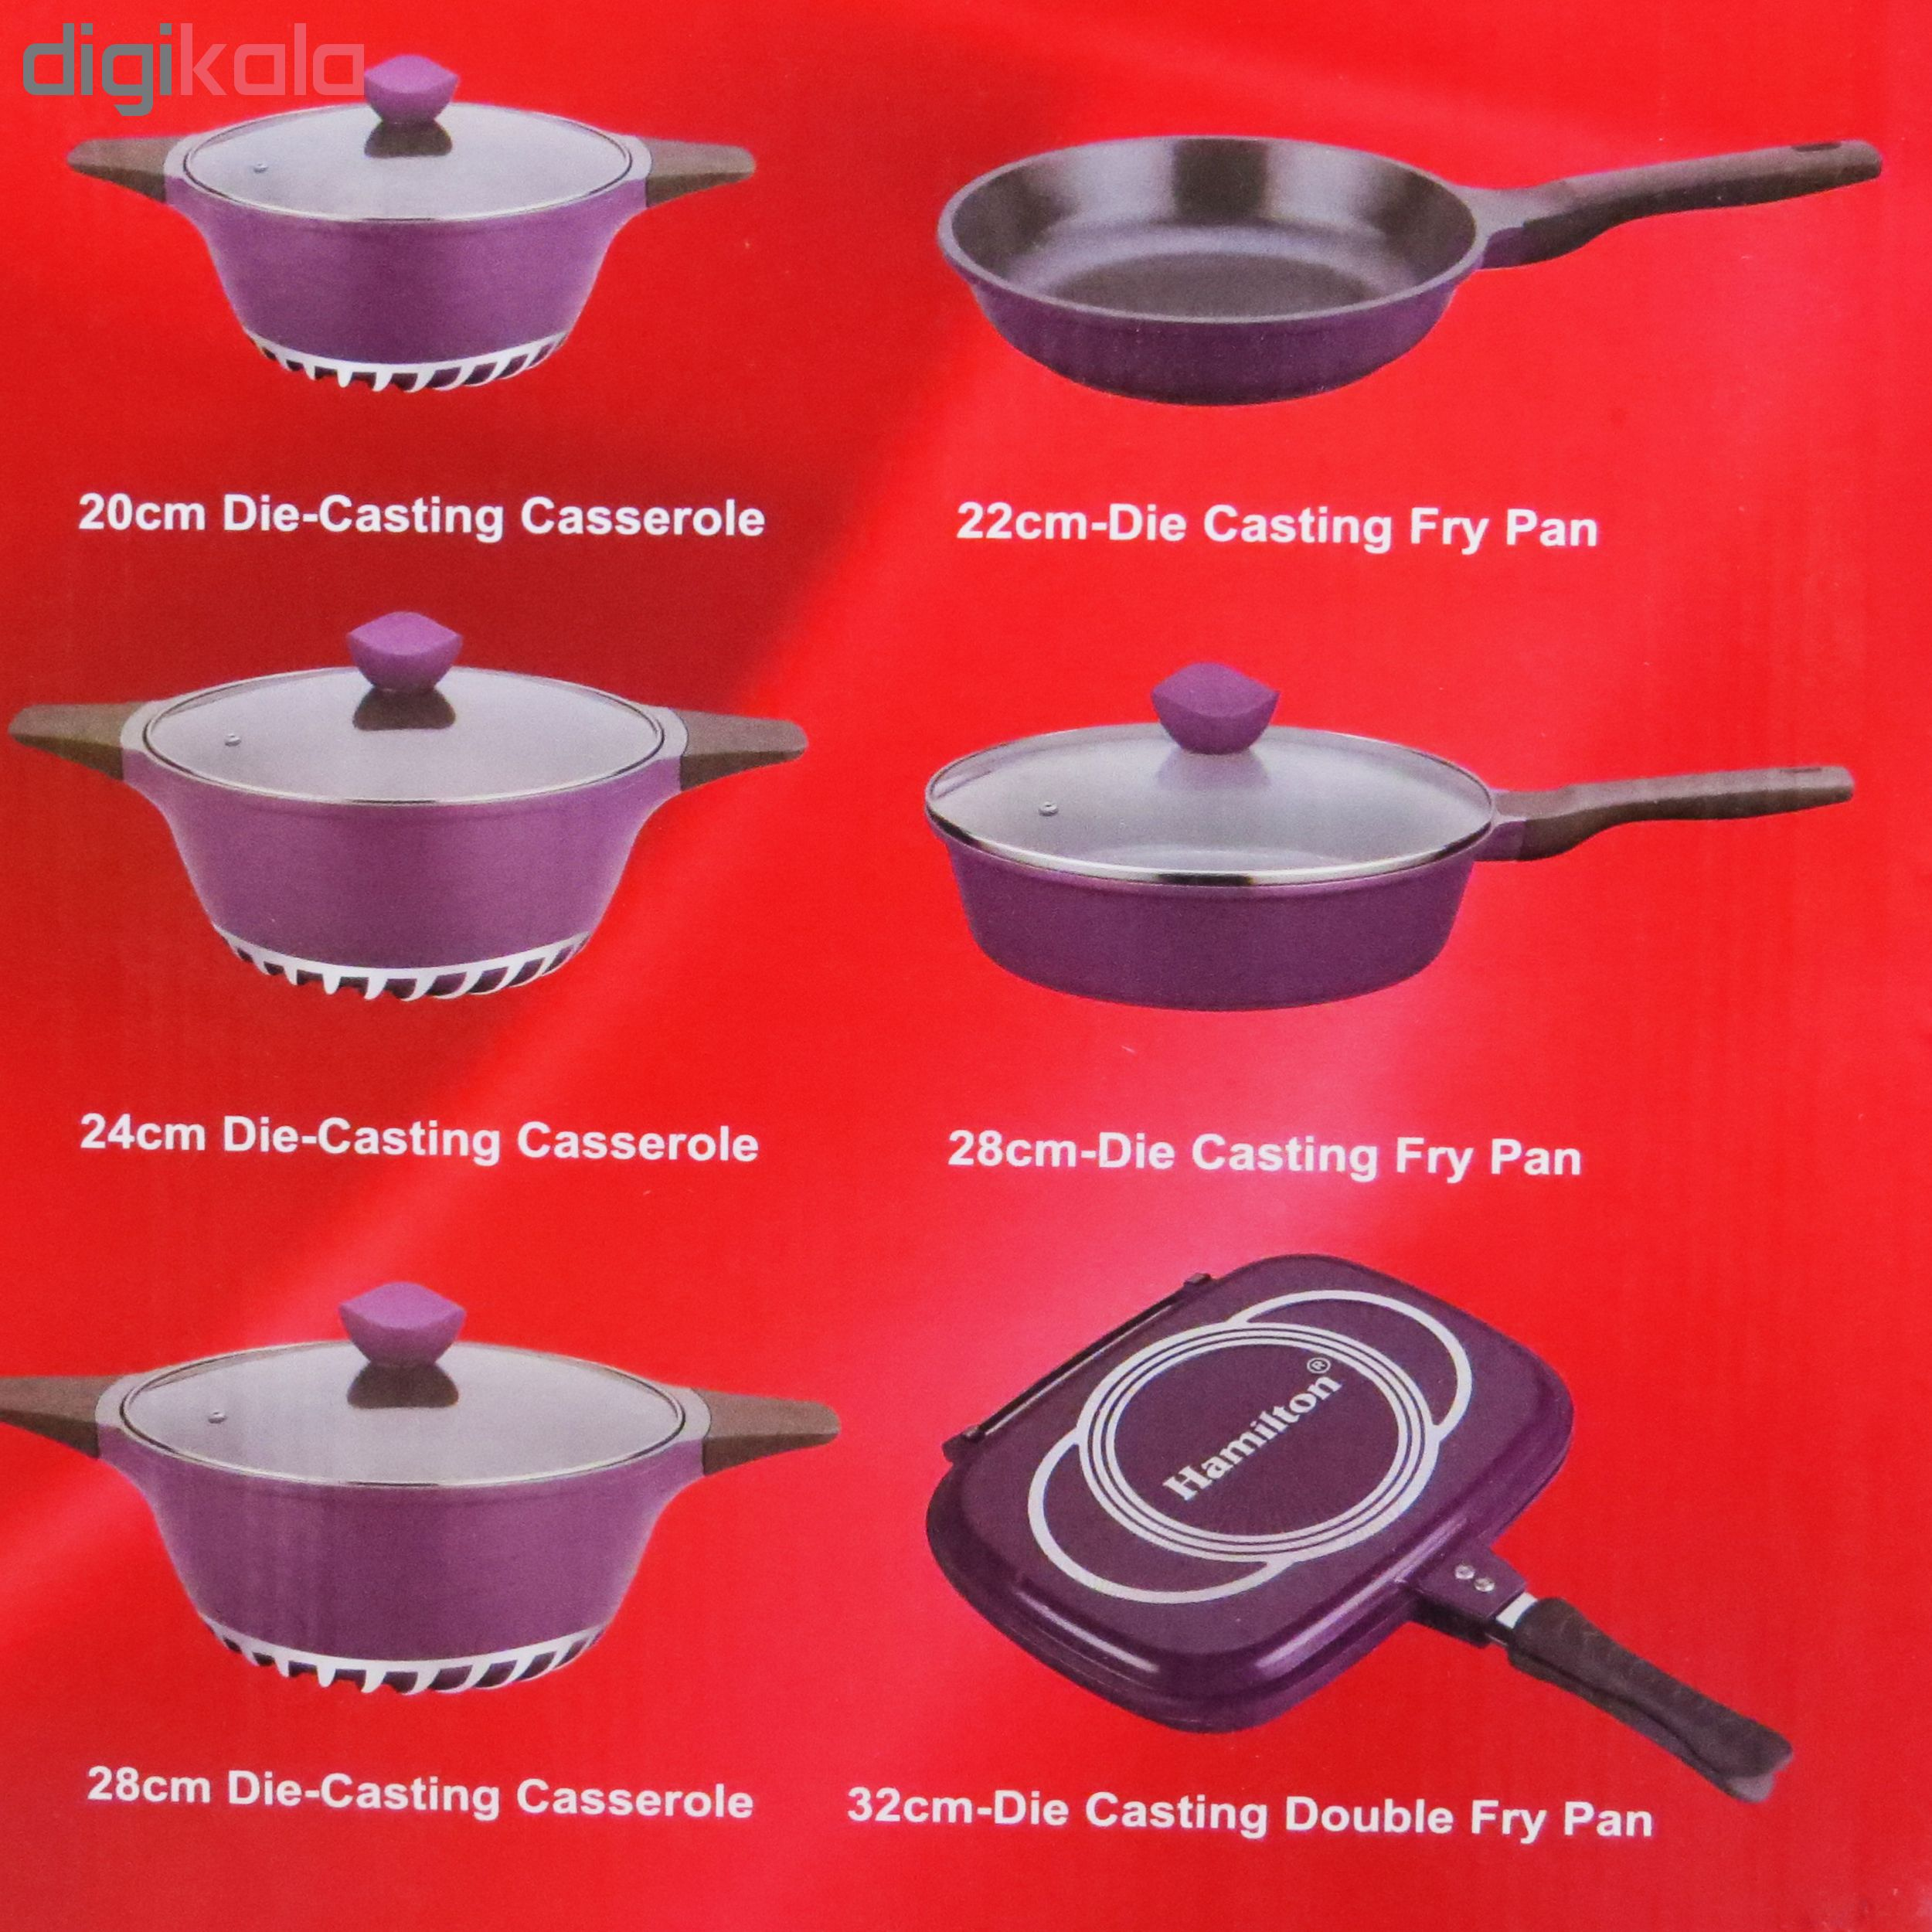 سرویس پخت و پز 19 پارچه همیلتون کد HS19